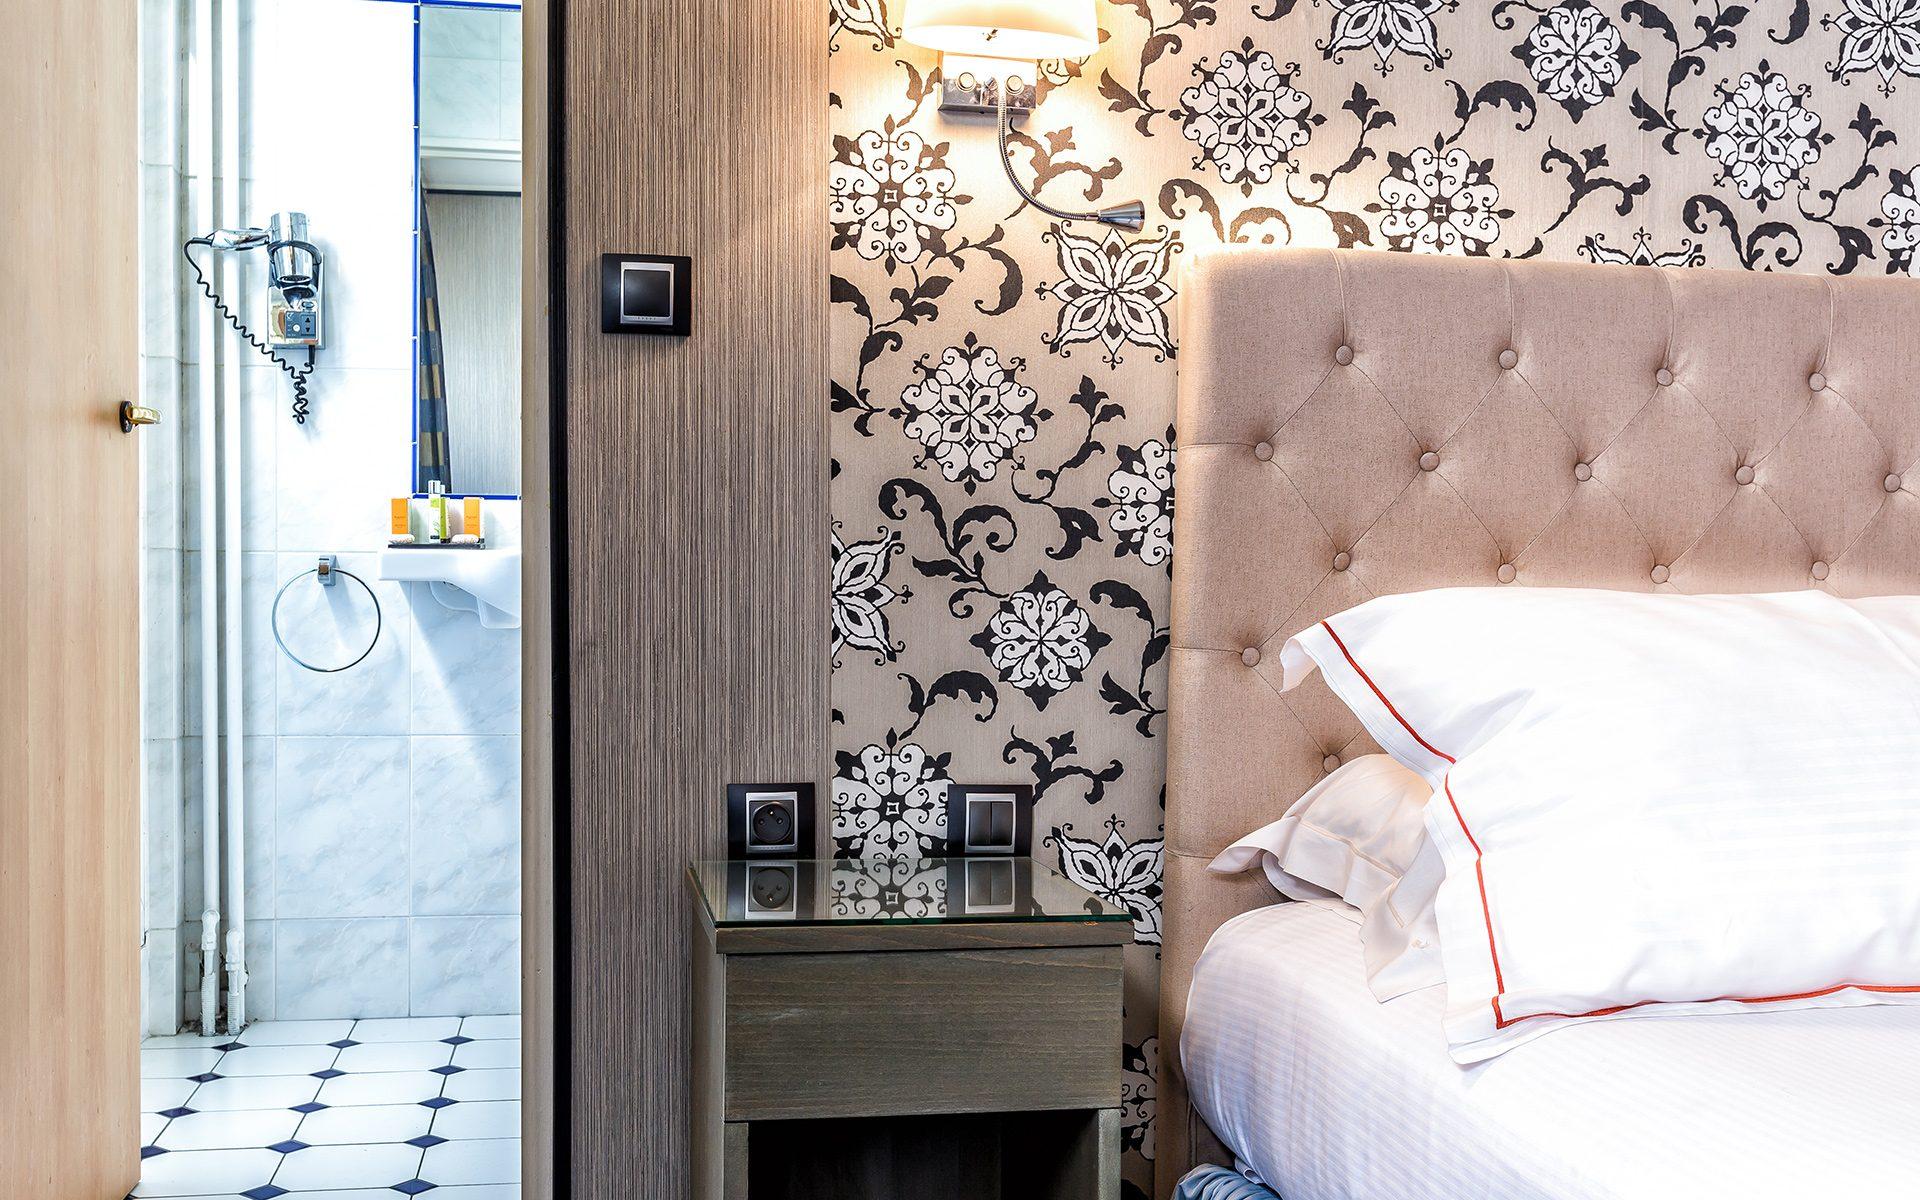 Hotel-Regence_Chambre302-5503-min